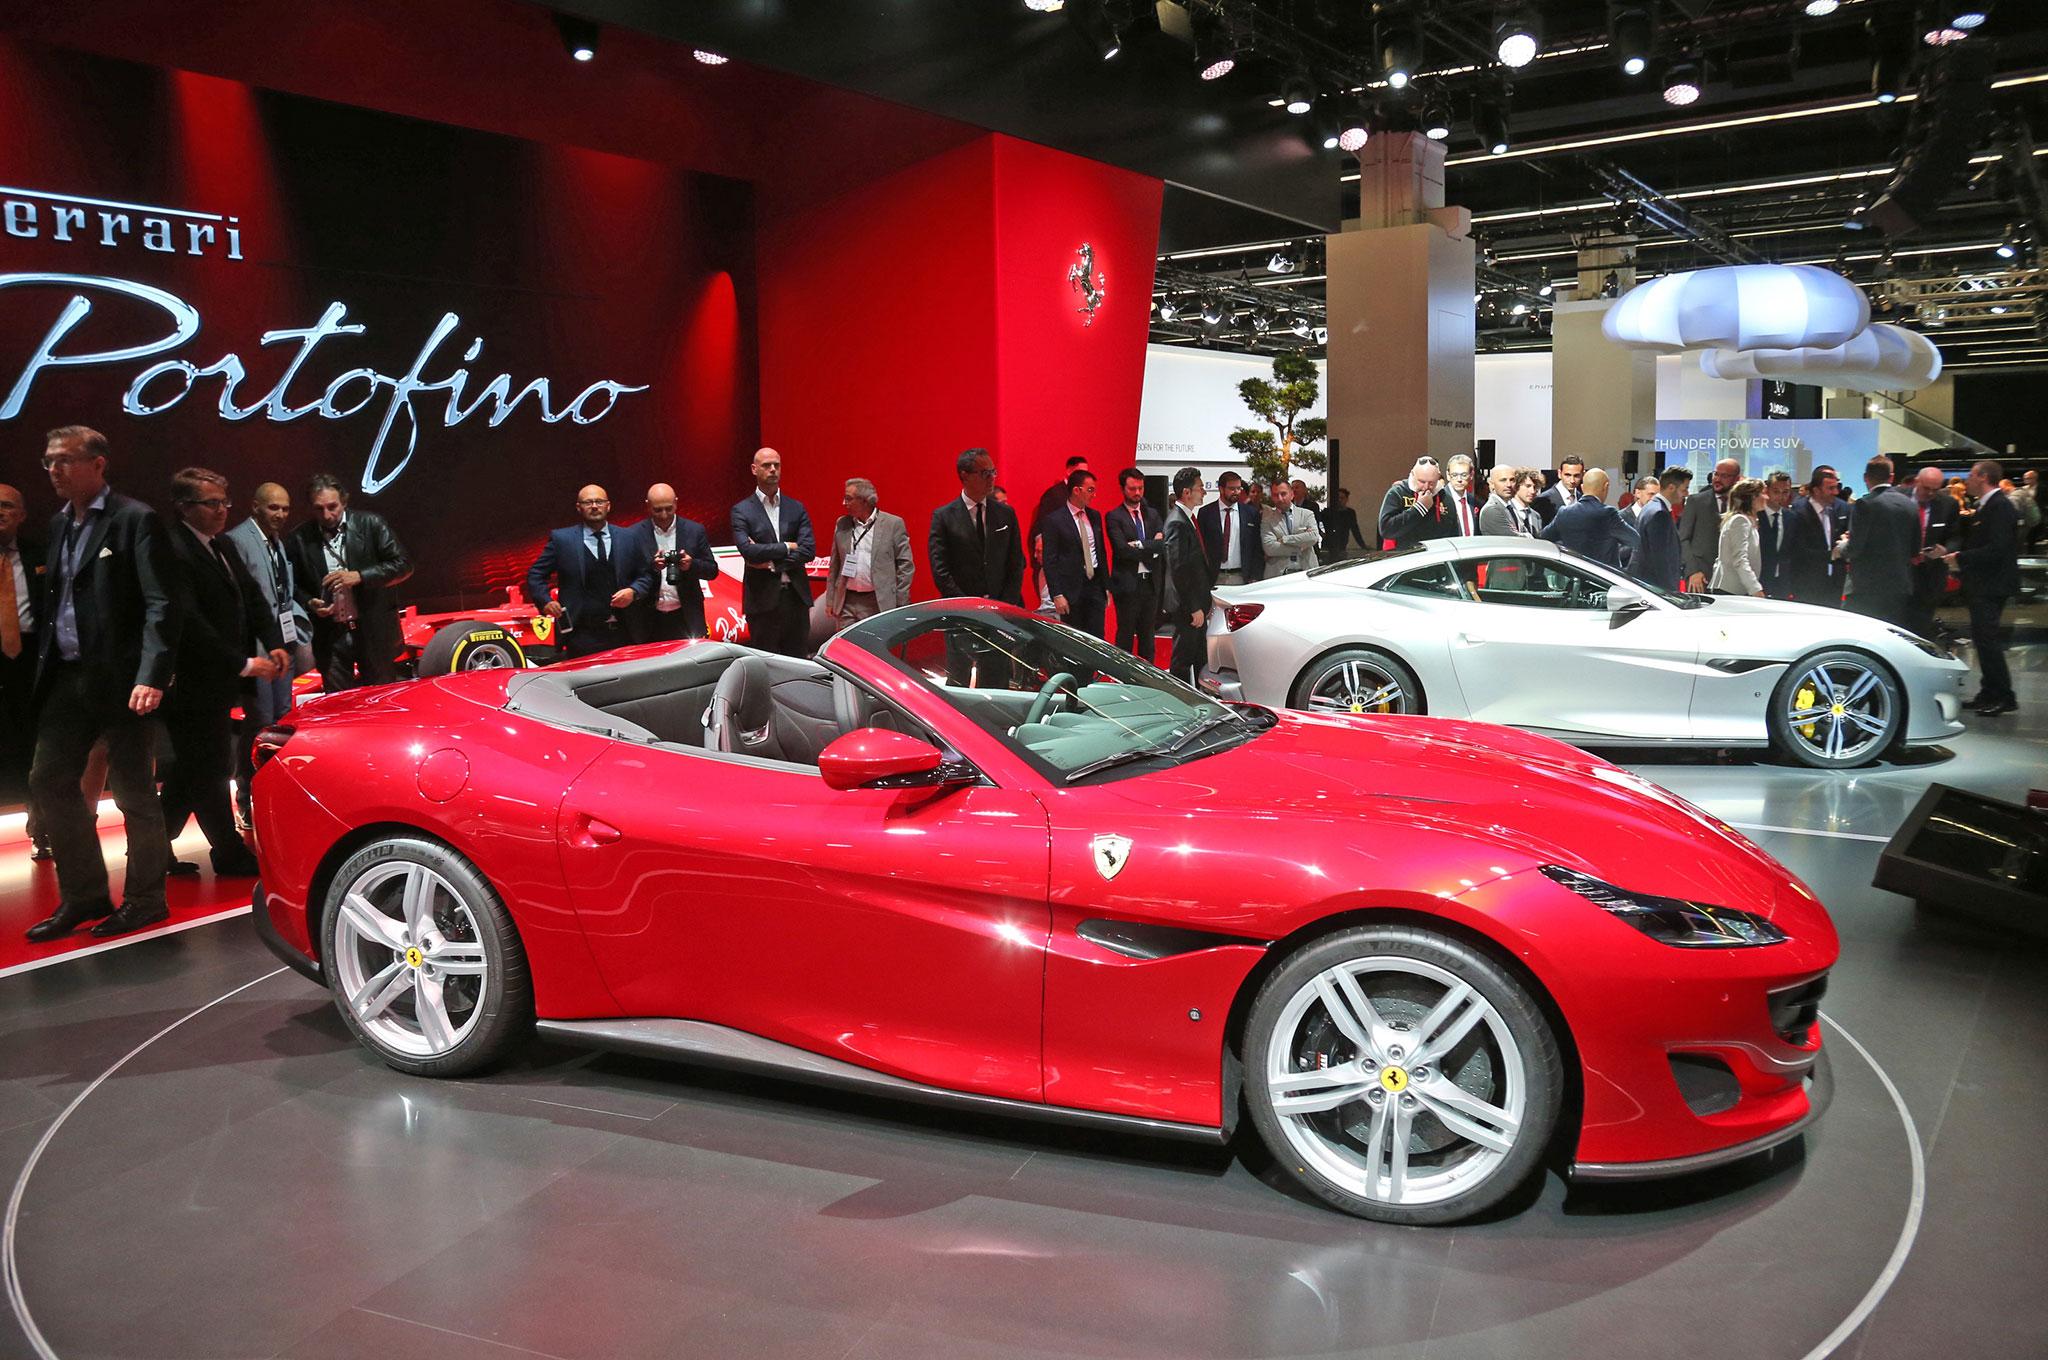 Ferrari-Portofino-in-Frankfurt-side-rear-view (1).jpg